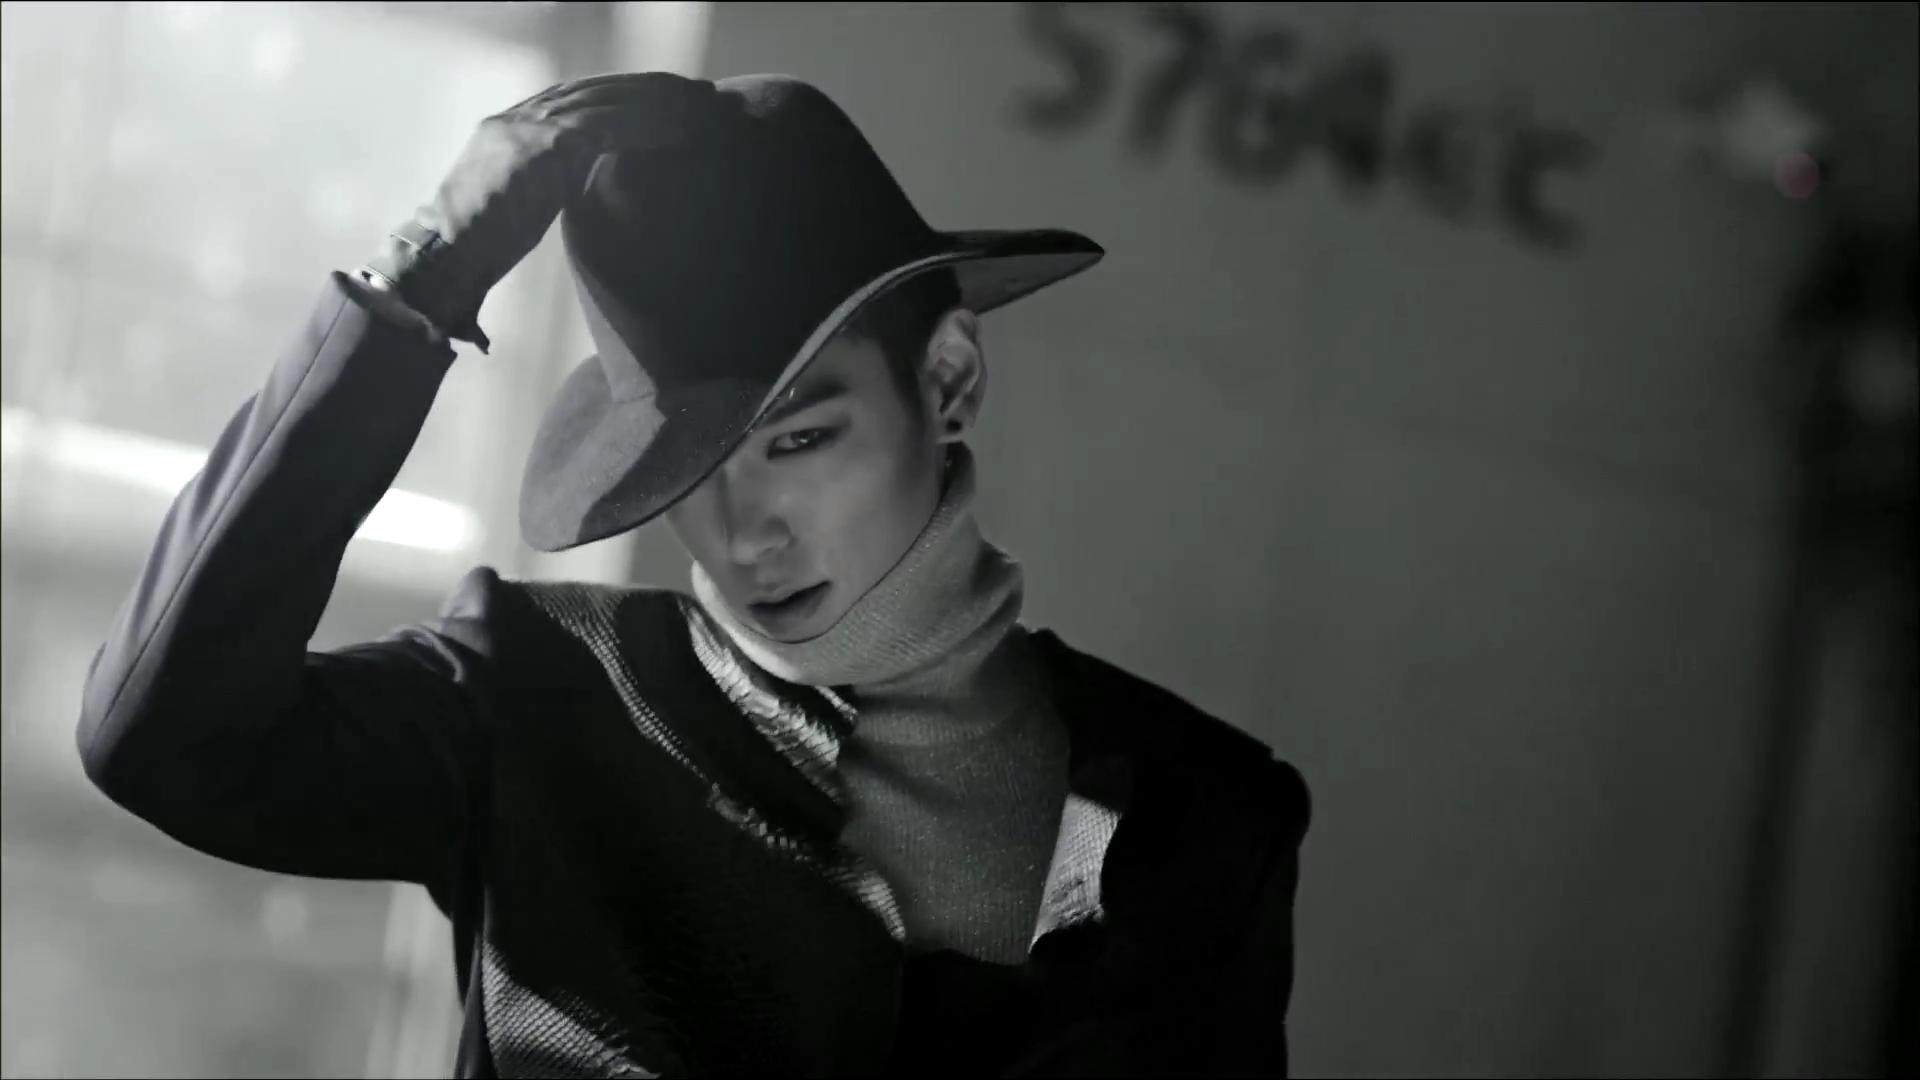 BIGBANG TOP MONSTER by Kuro-kokoro on DeviantArt